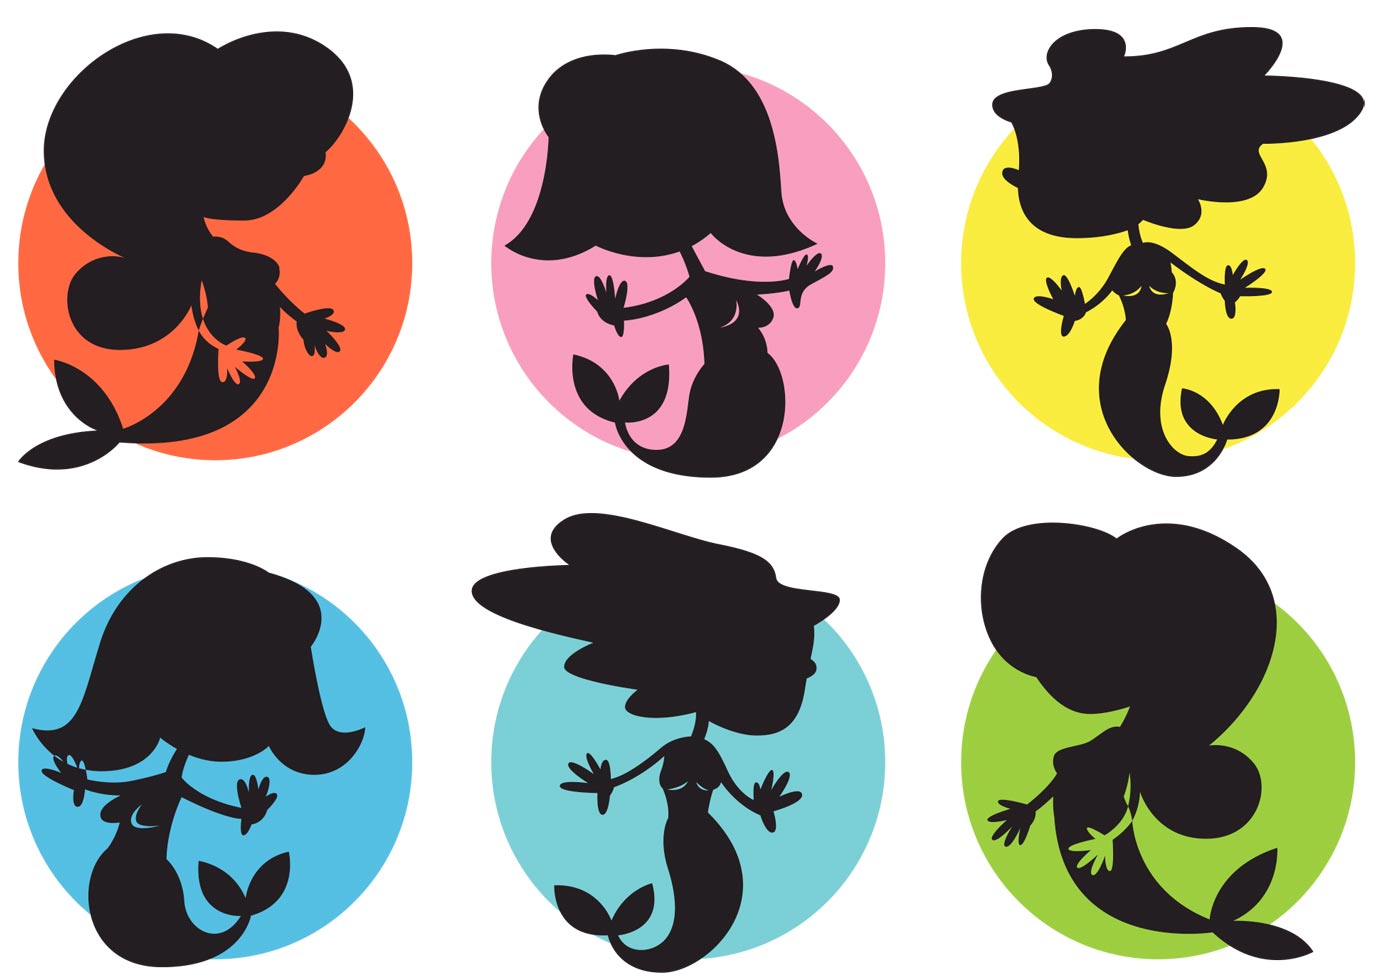 Cartoon Mermaids Vector Silhouettes Illustrations Free ...